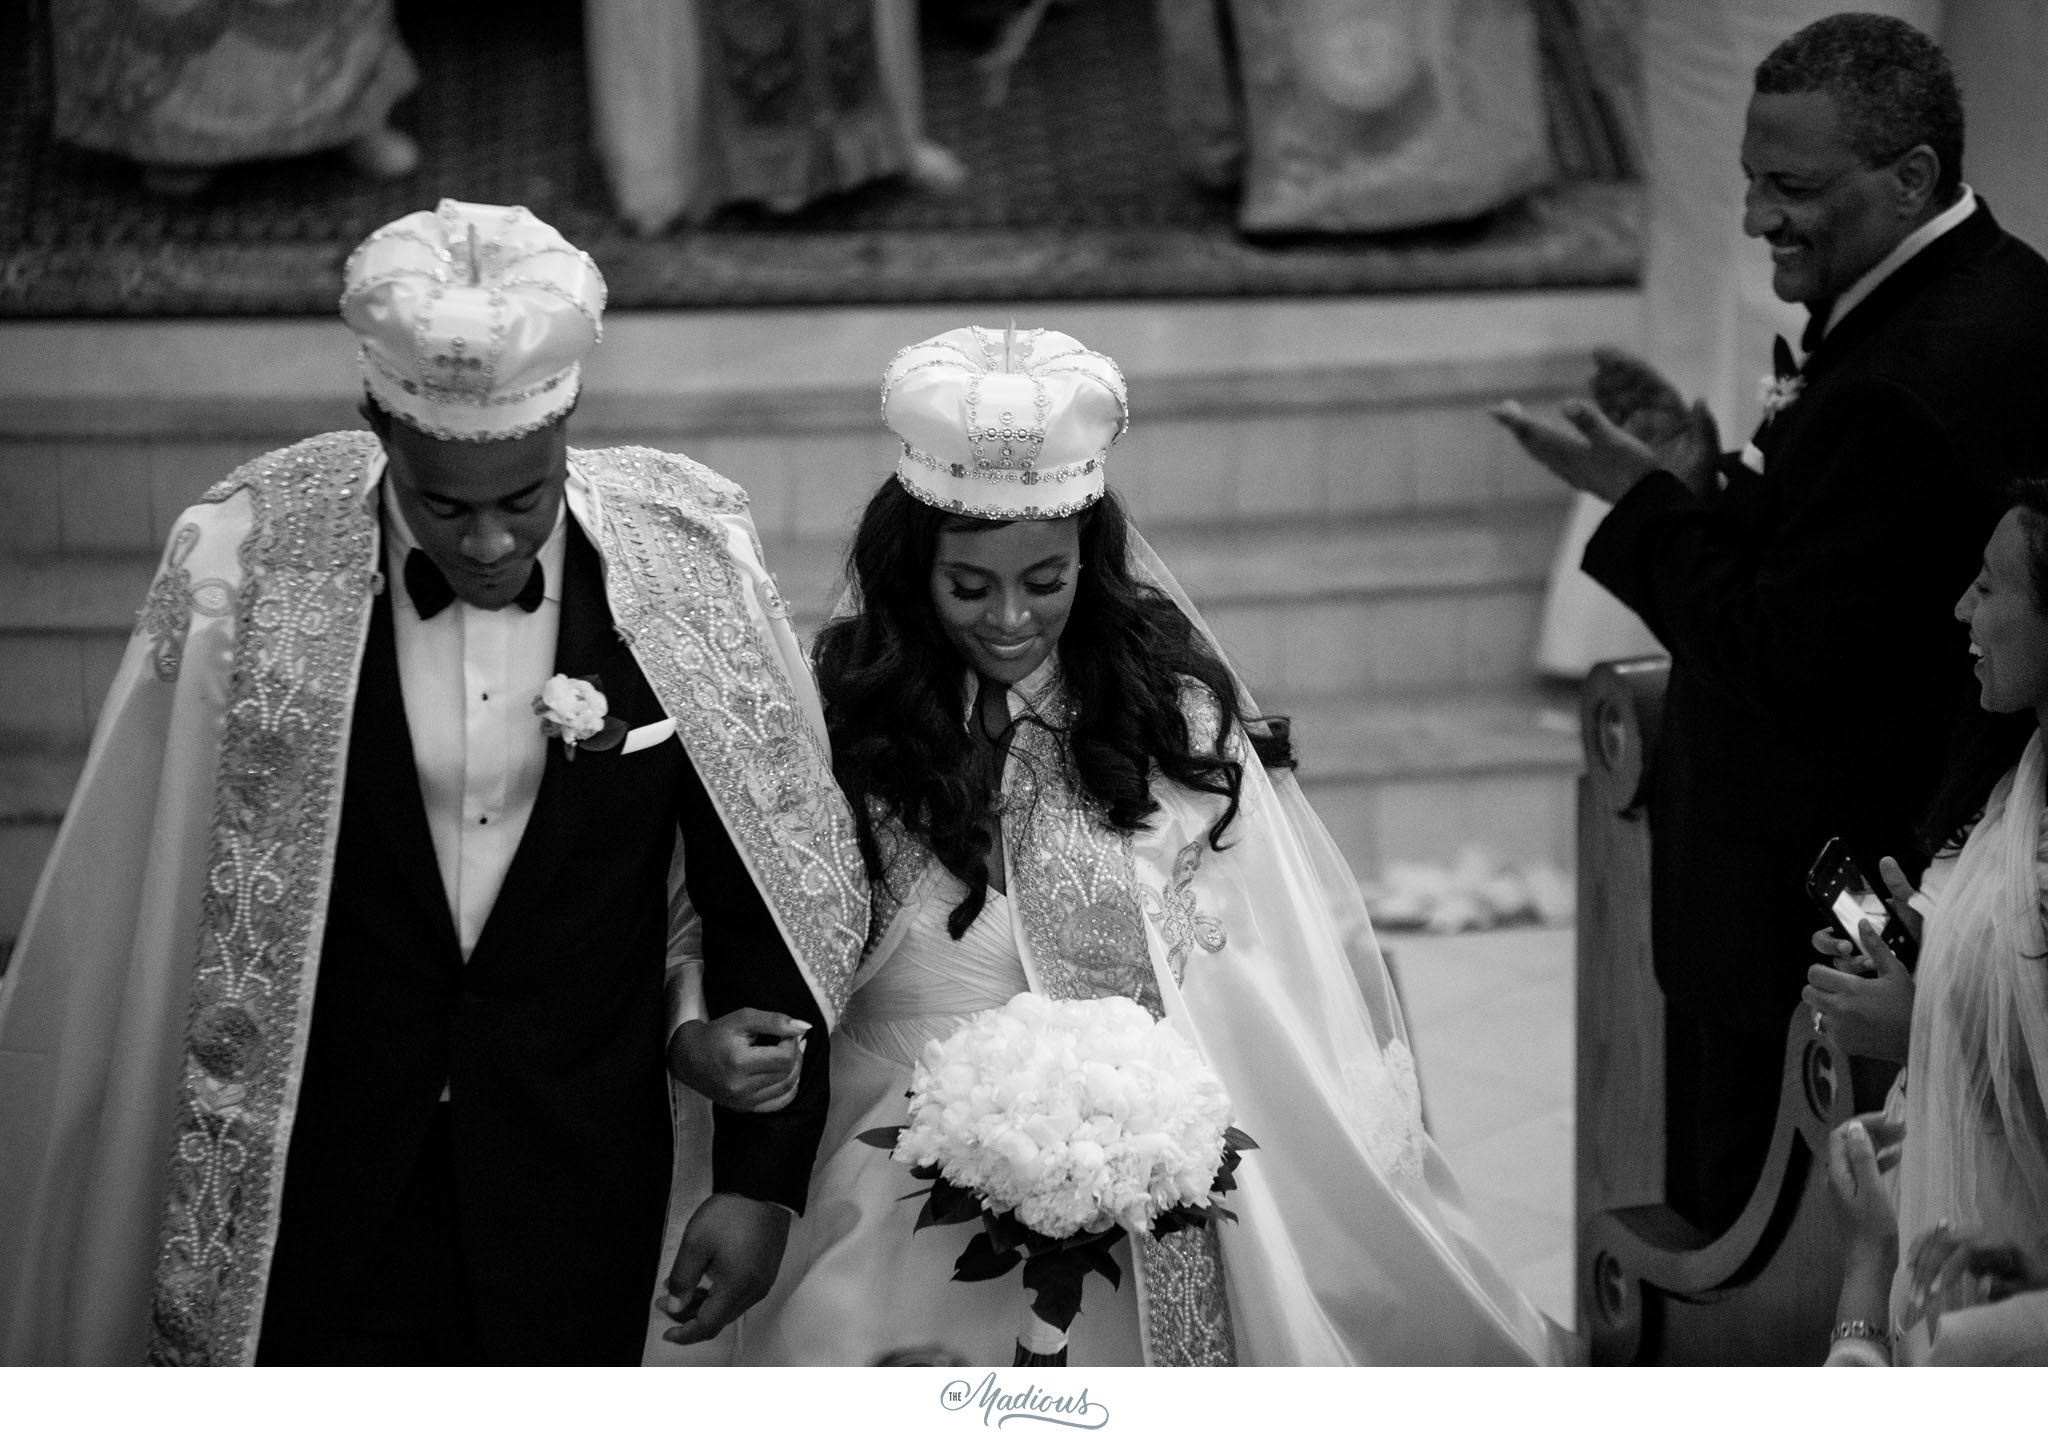 nmwa+wedding,+women+in+the+arts+wedding,+ethiopian+wedding,+dc+wedding+0103.jpg